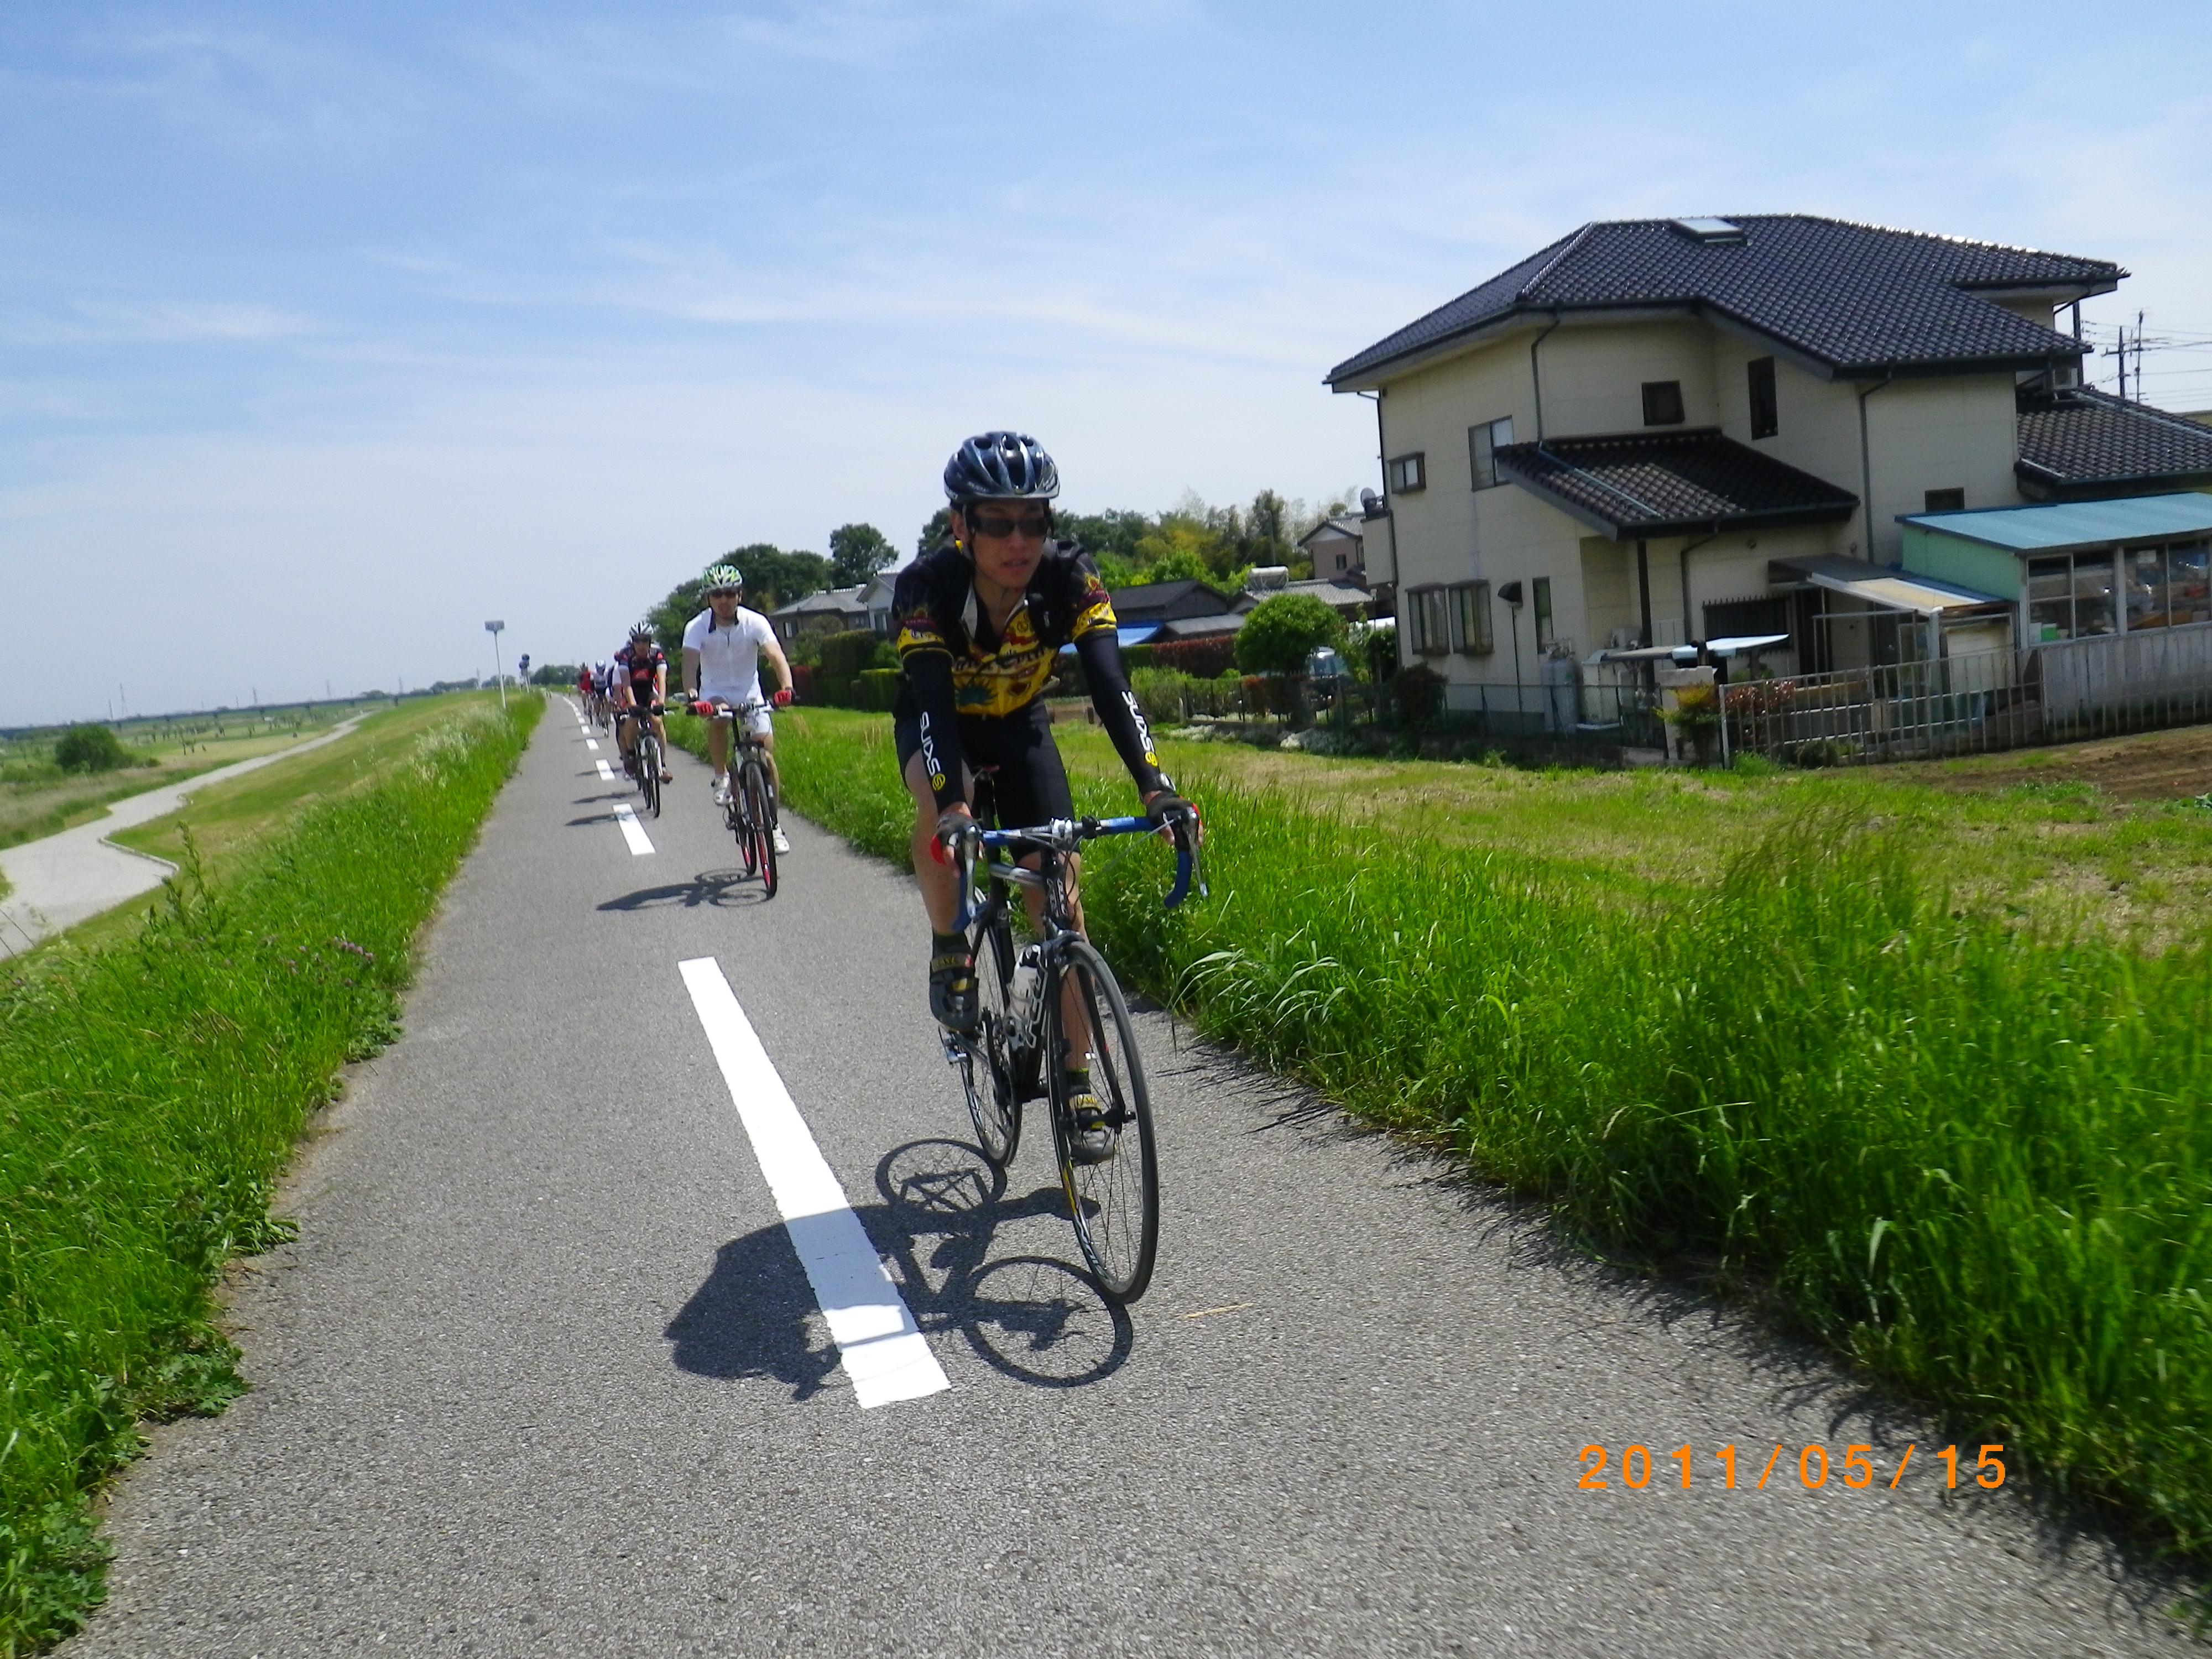 http://cycleshop-fun.com/images/IMGP1479.JPG